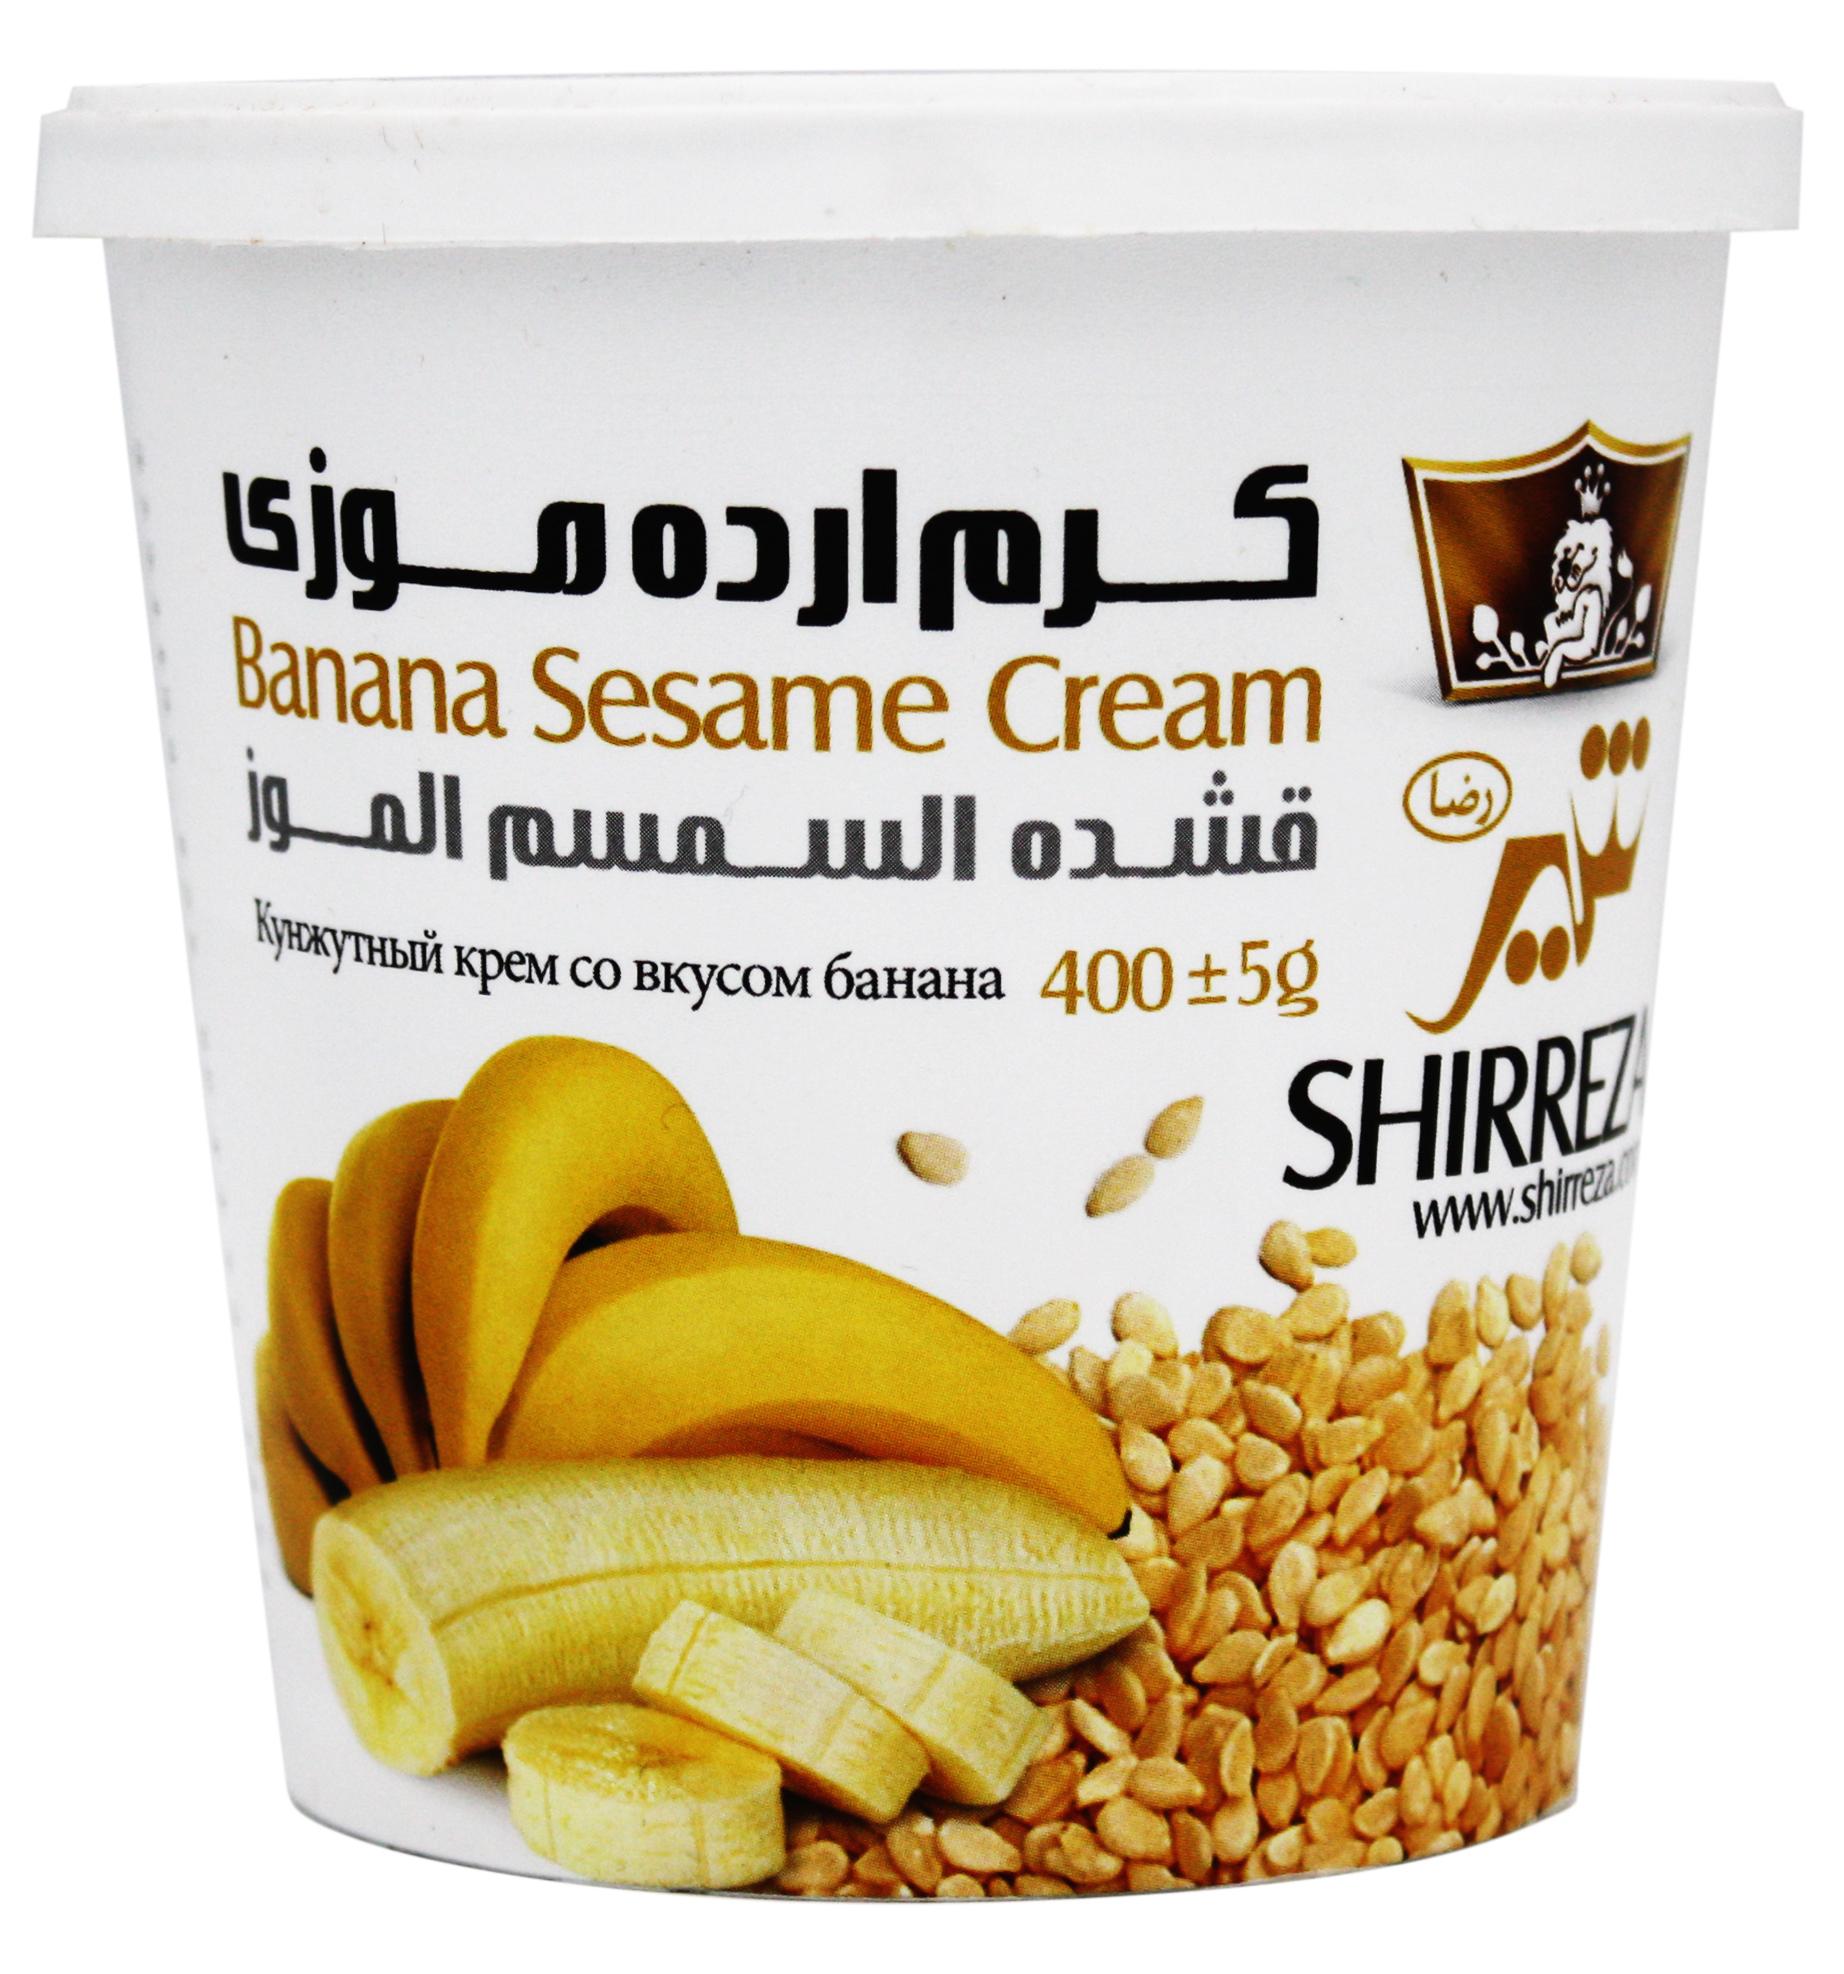 Паста Кунжутный крем с бананом, Shirreza, 400 г import_files_38_3818a55adaac11e9a9b6484d7ecee297_c2b1d526ebee11e9a9b7484d7ecee297.jpg